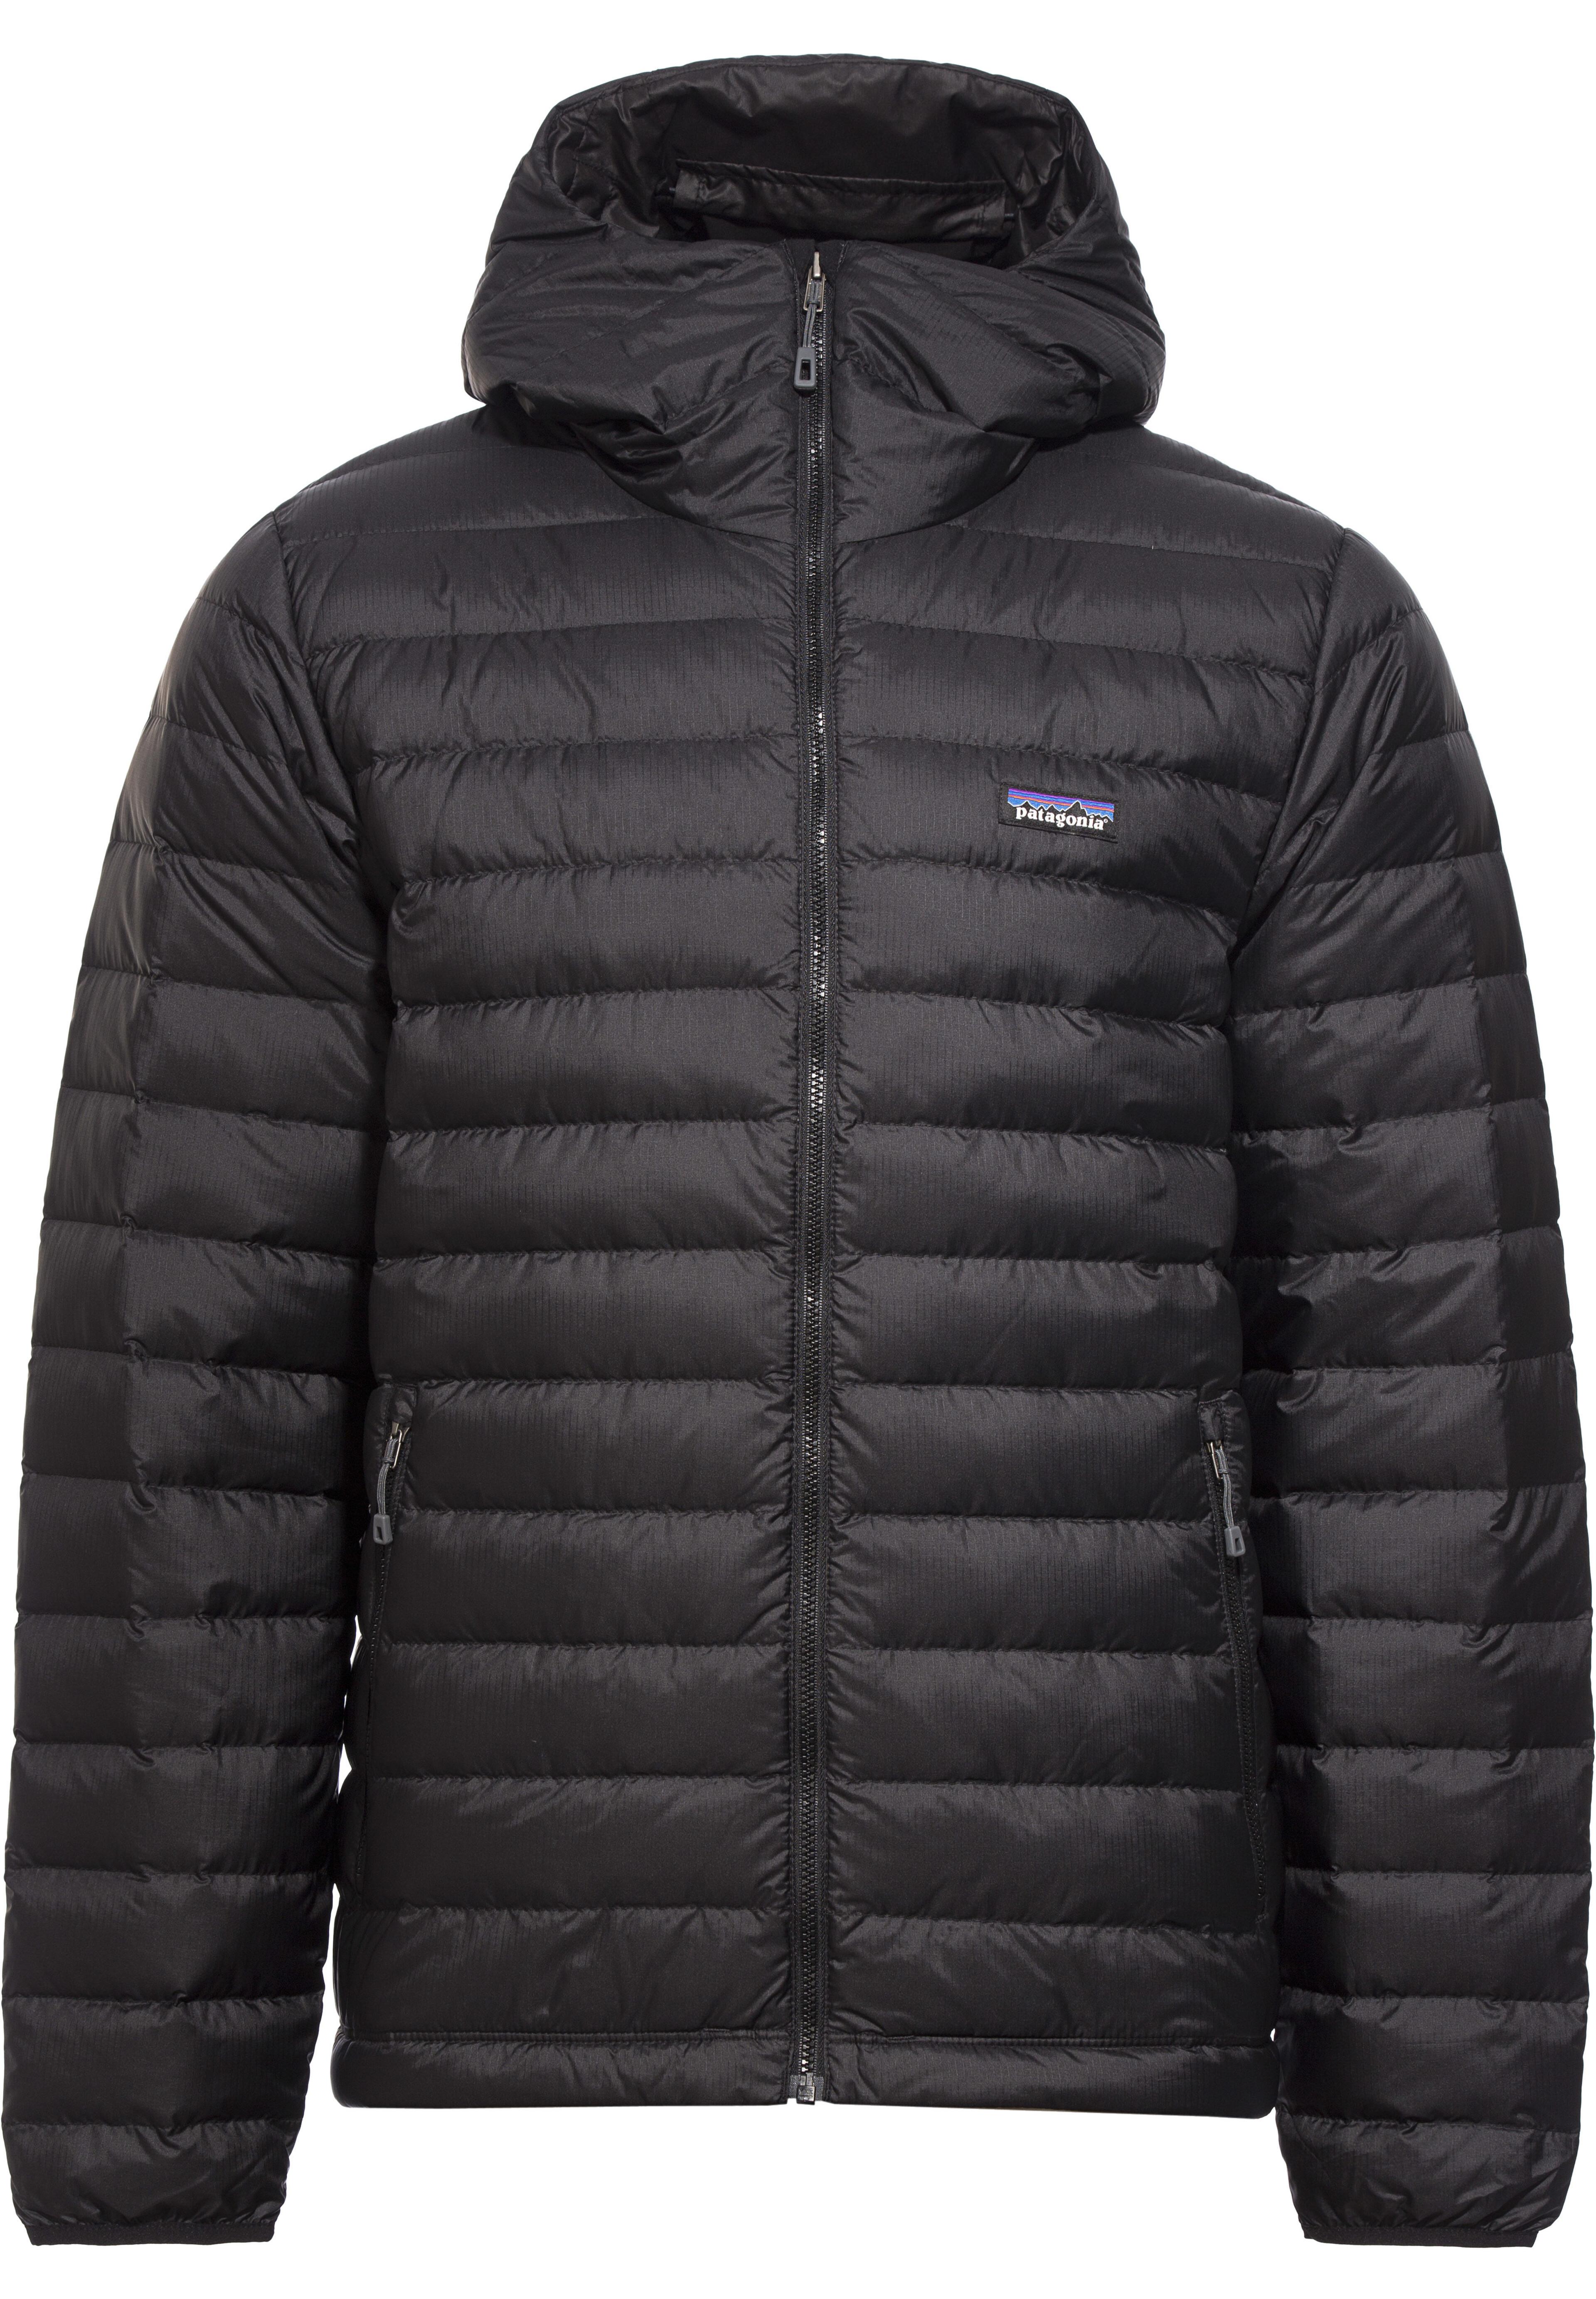 c18ddd7f144 Patagonia Down Sweater - Chaqueta Hombre - negro